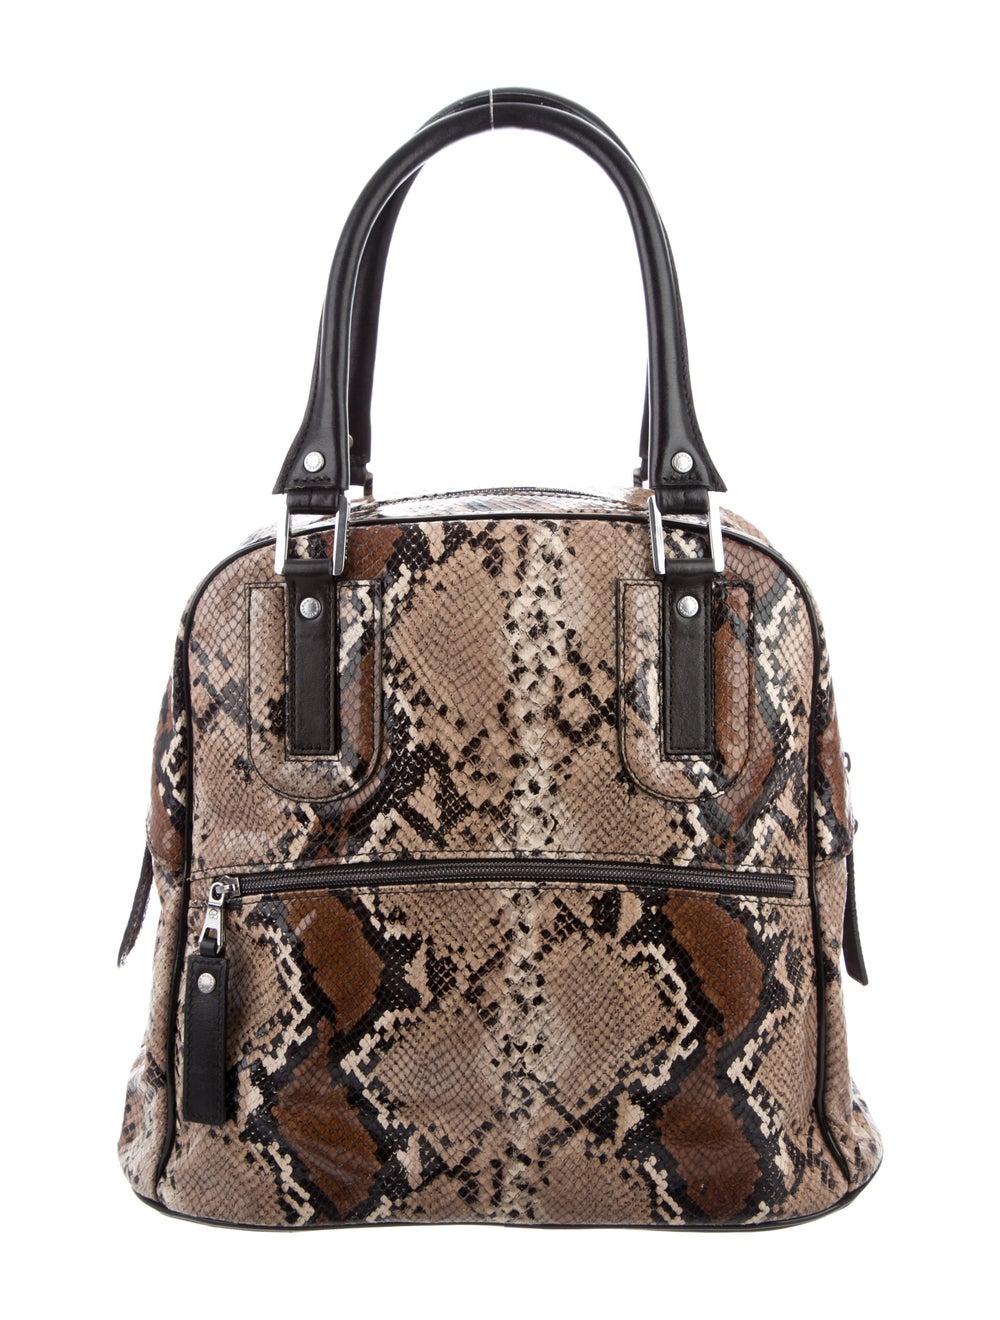 Longchamp Python Leather Tote Brown - image 4